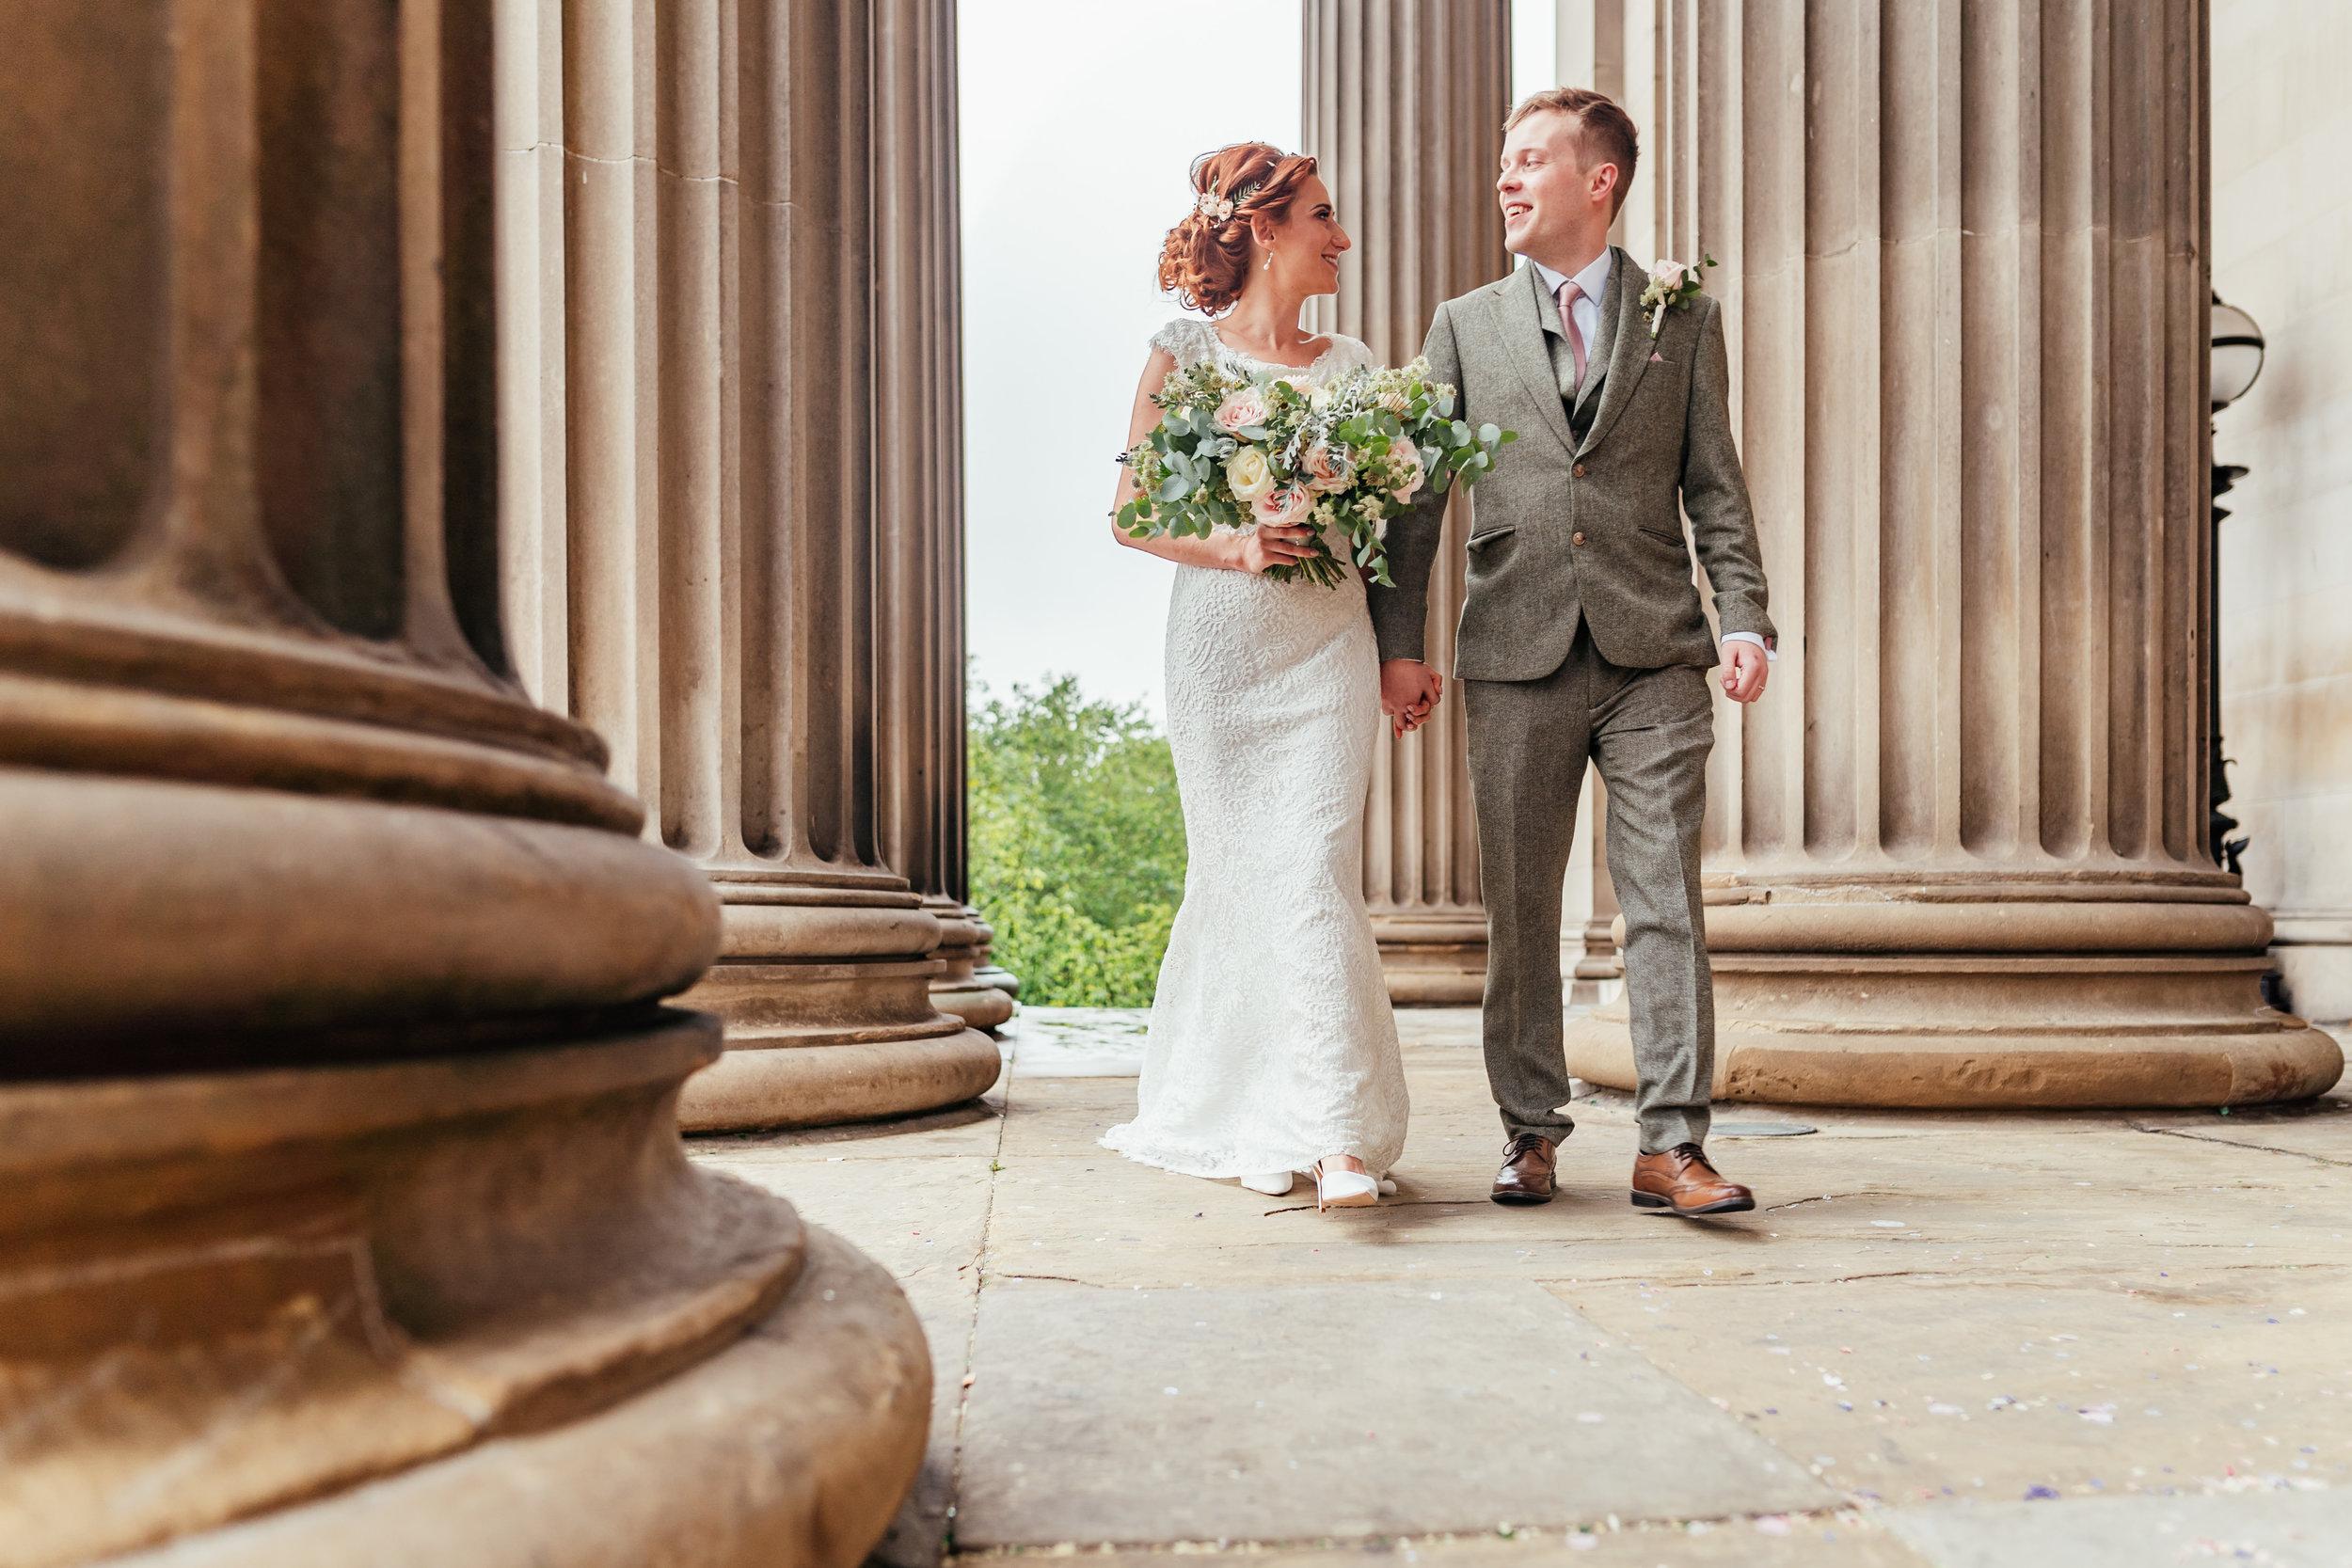 st-georges-hall-liverpool-wedding-140.jpg